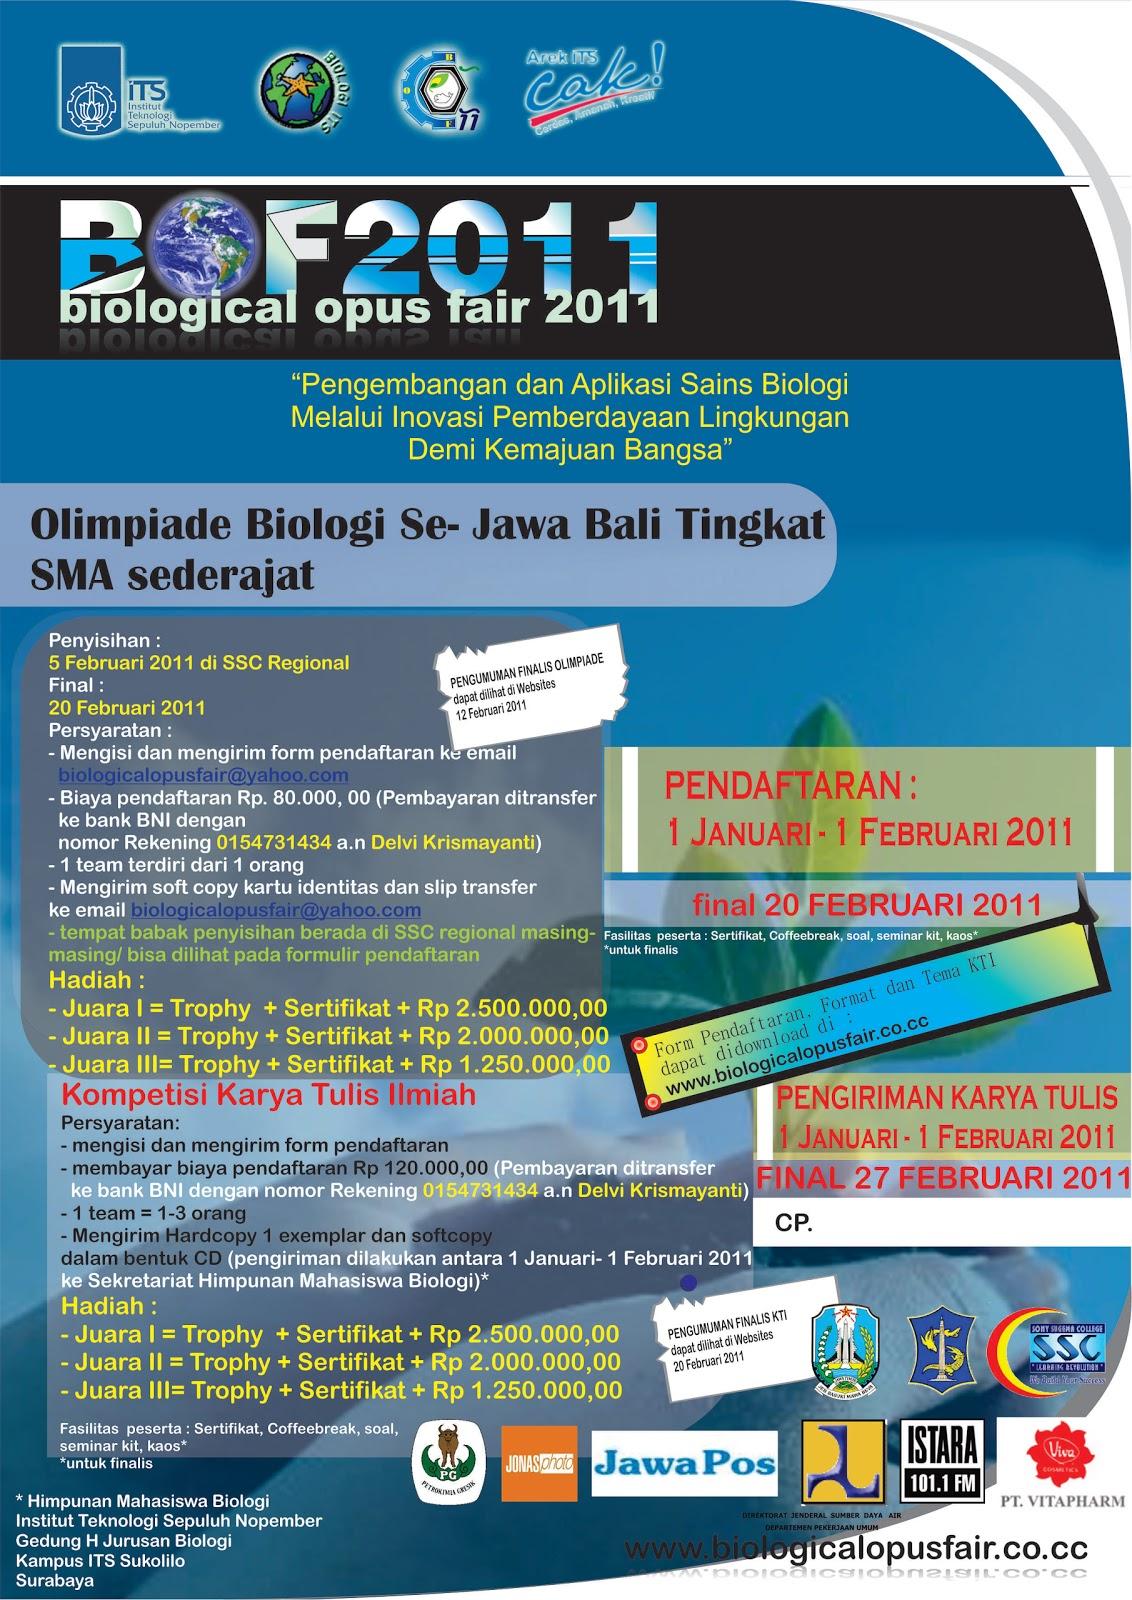 Contoh Karya Tulis Ilmiah Biologi Sma Abramgaskins1 S Blog